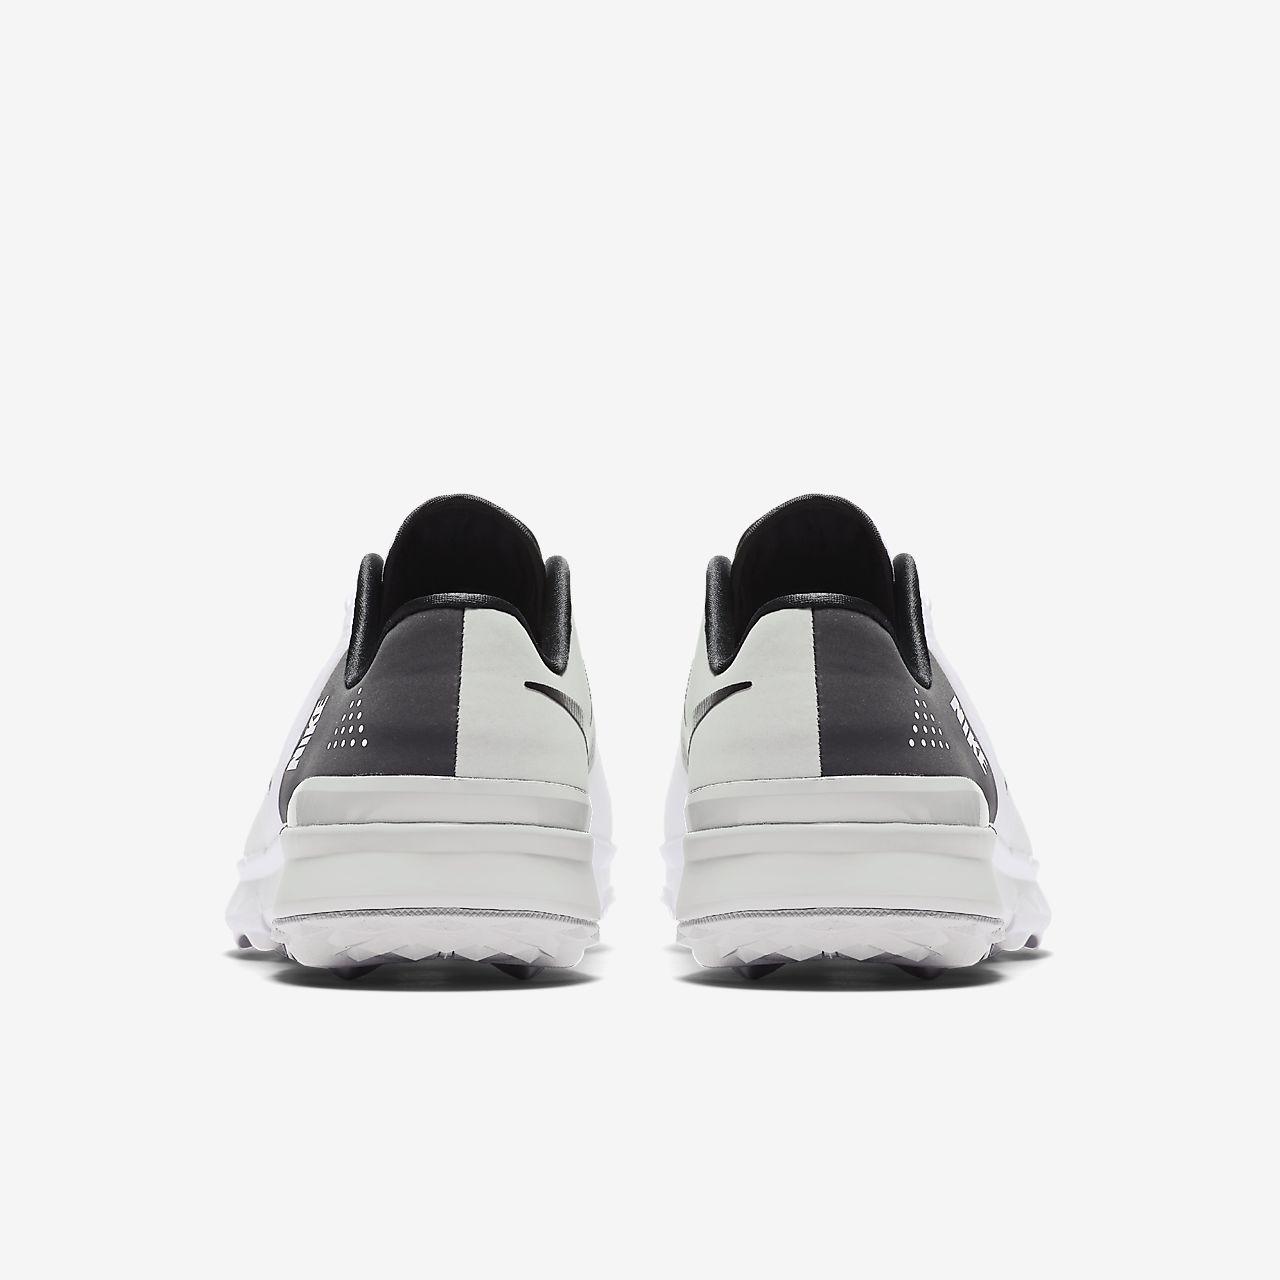 dcdeac23ea3b Nike FI Flex (Wide) Men s Golf Shoe. Nike.com ID